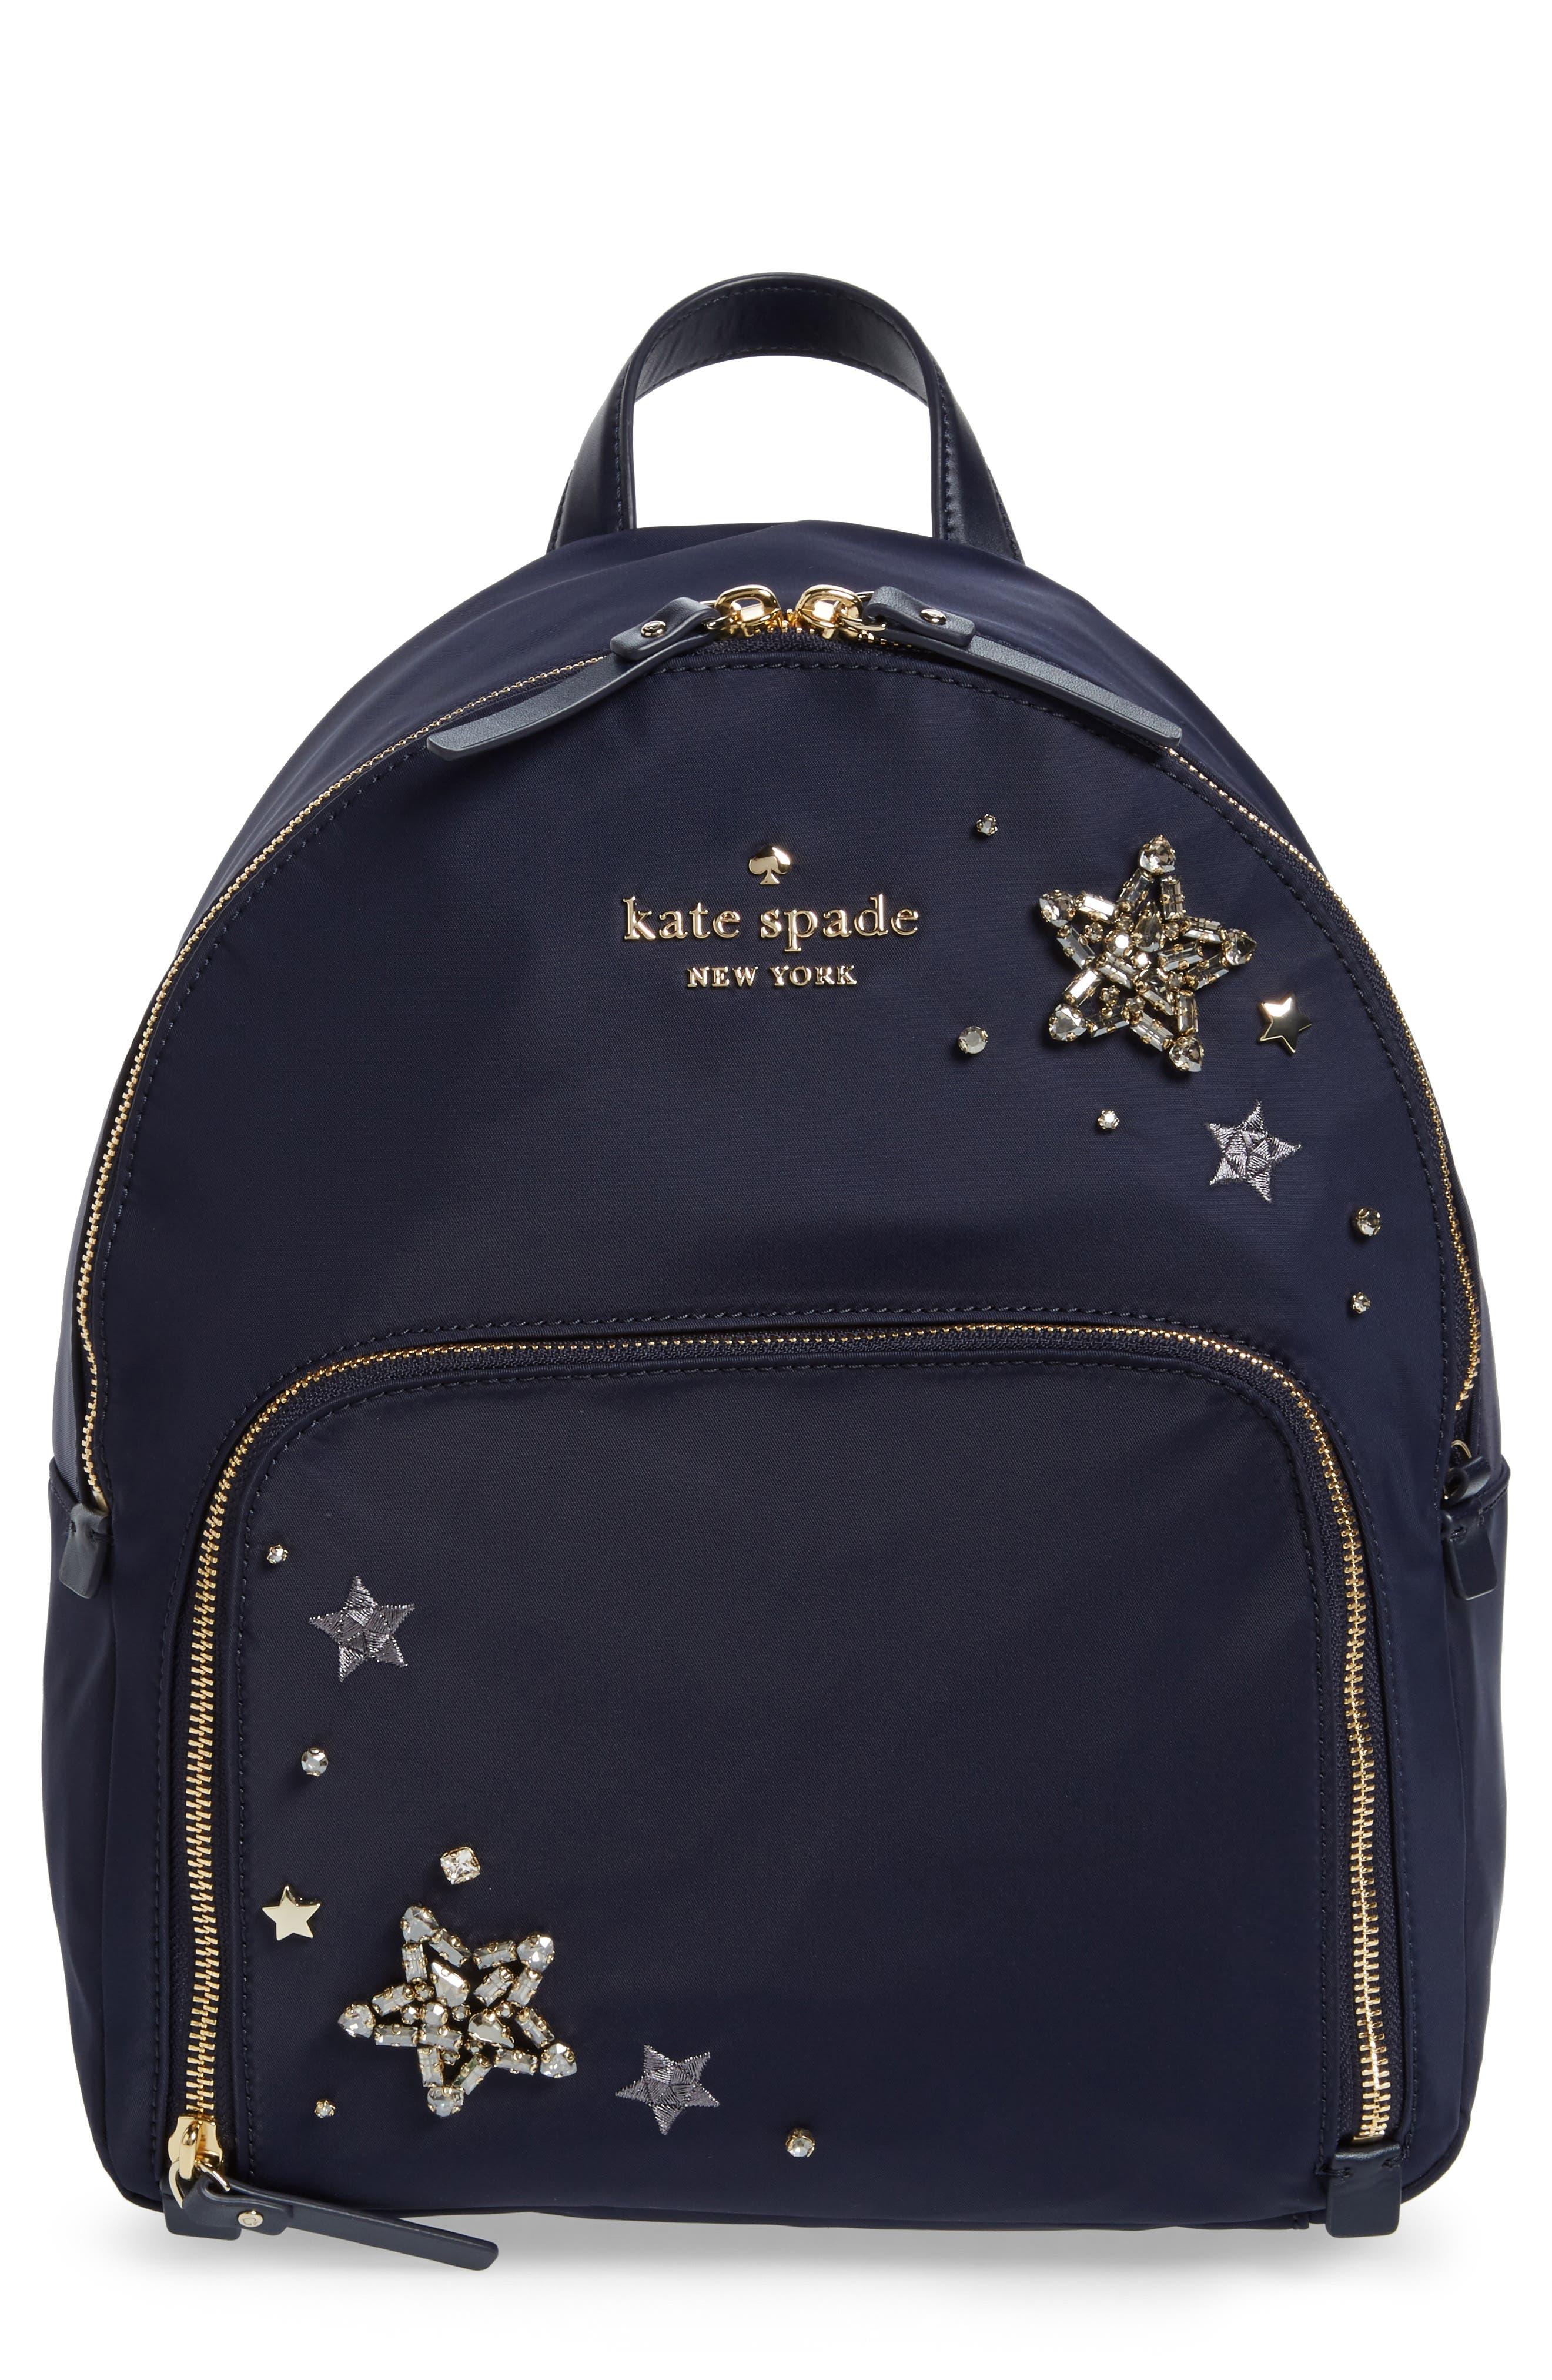 watson lane - hartley embellished nylon backpack,                         Main,                         color,